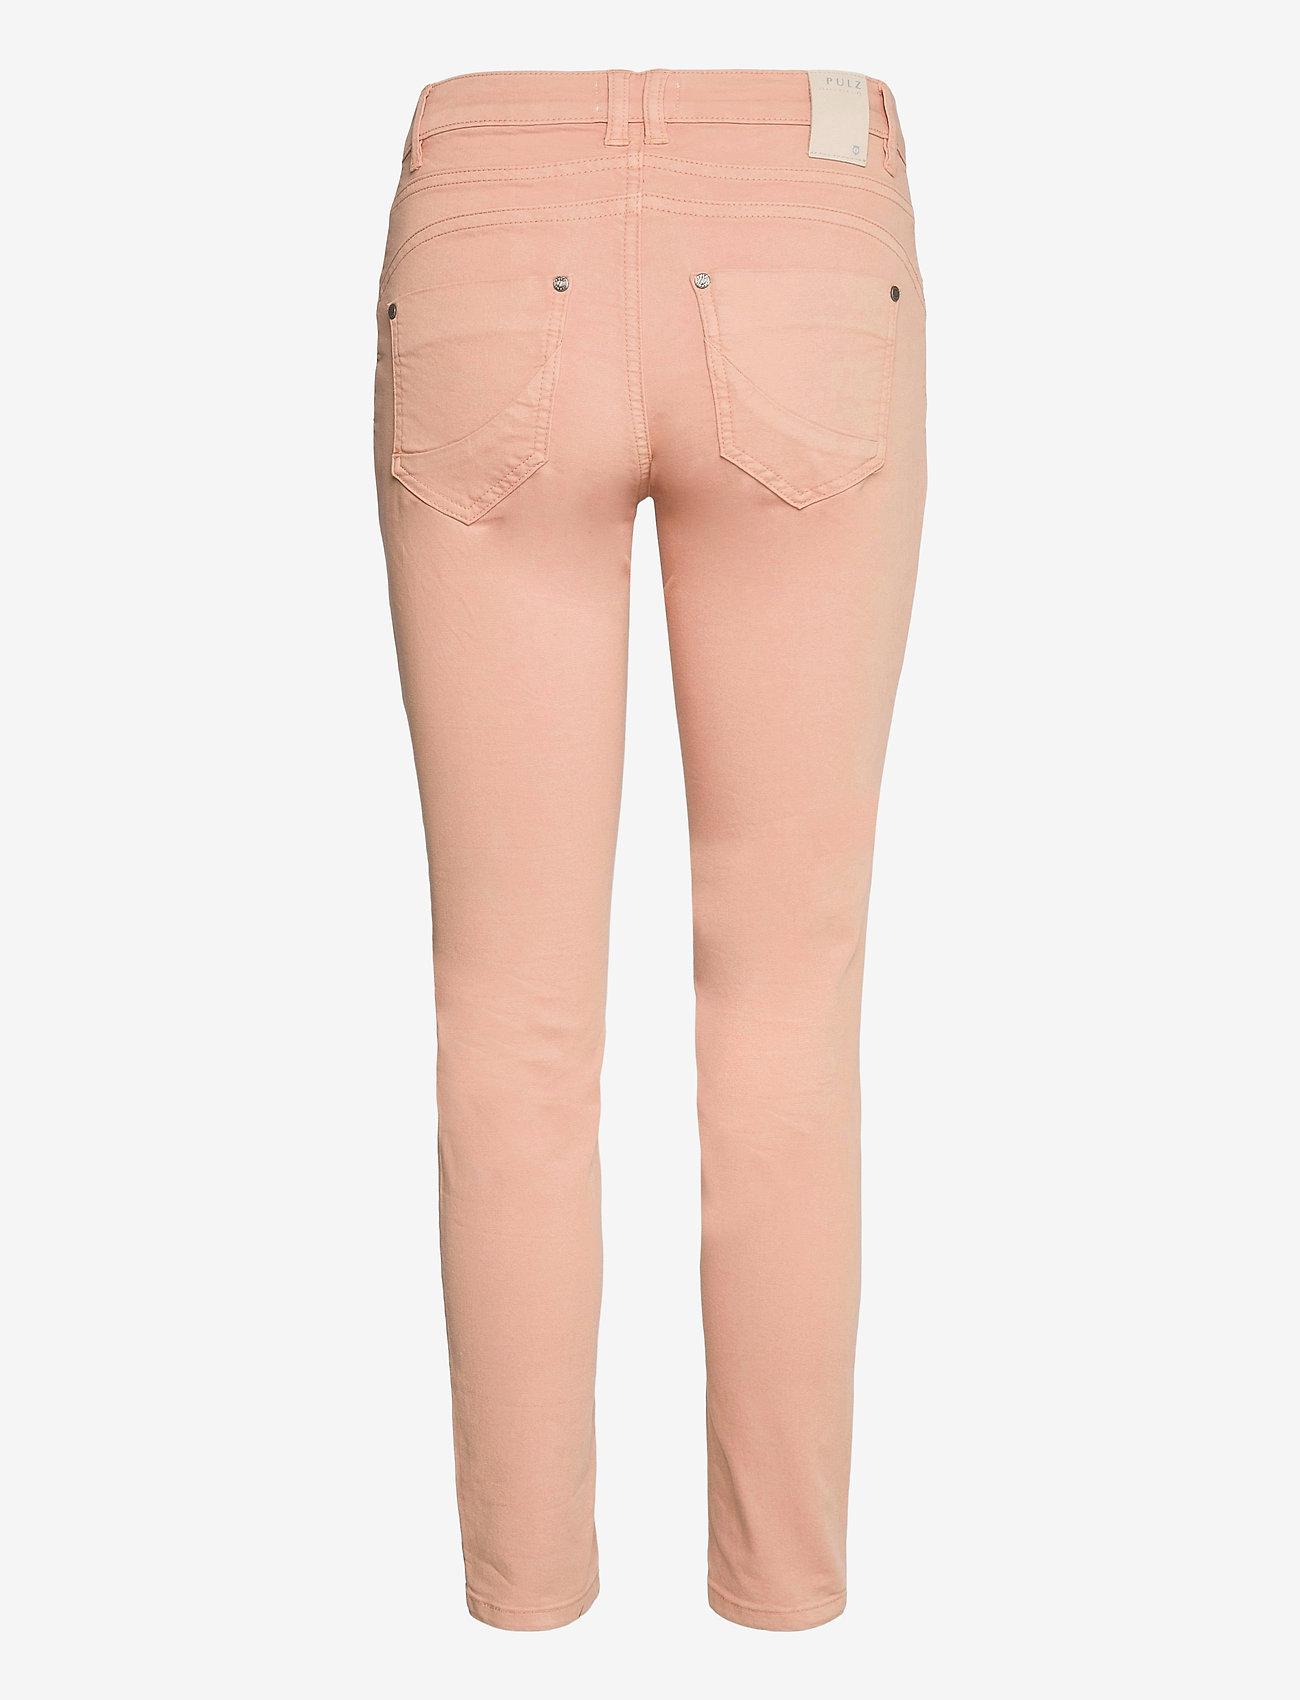 Pulz Jeans - PZROSITA PANT - skinny jeans - mahogany rose - 1